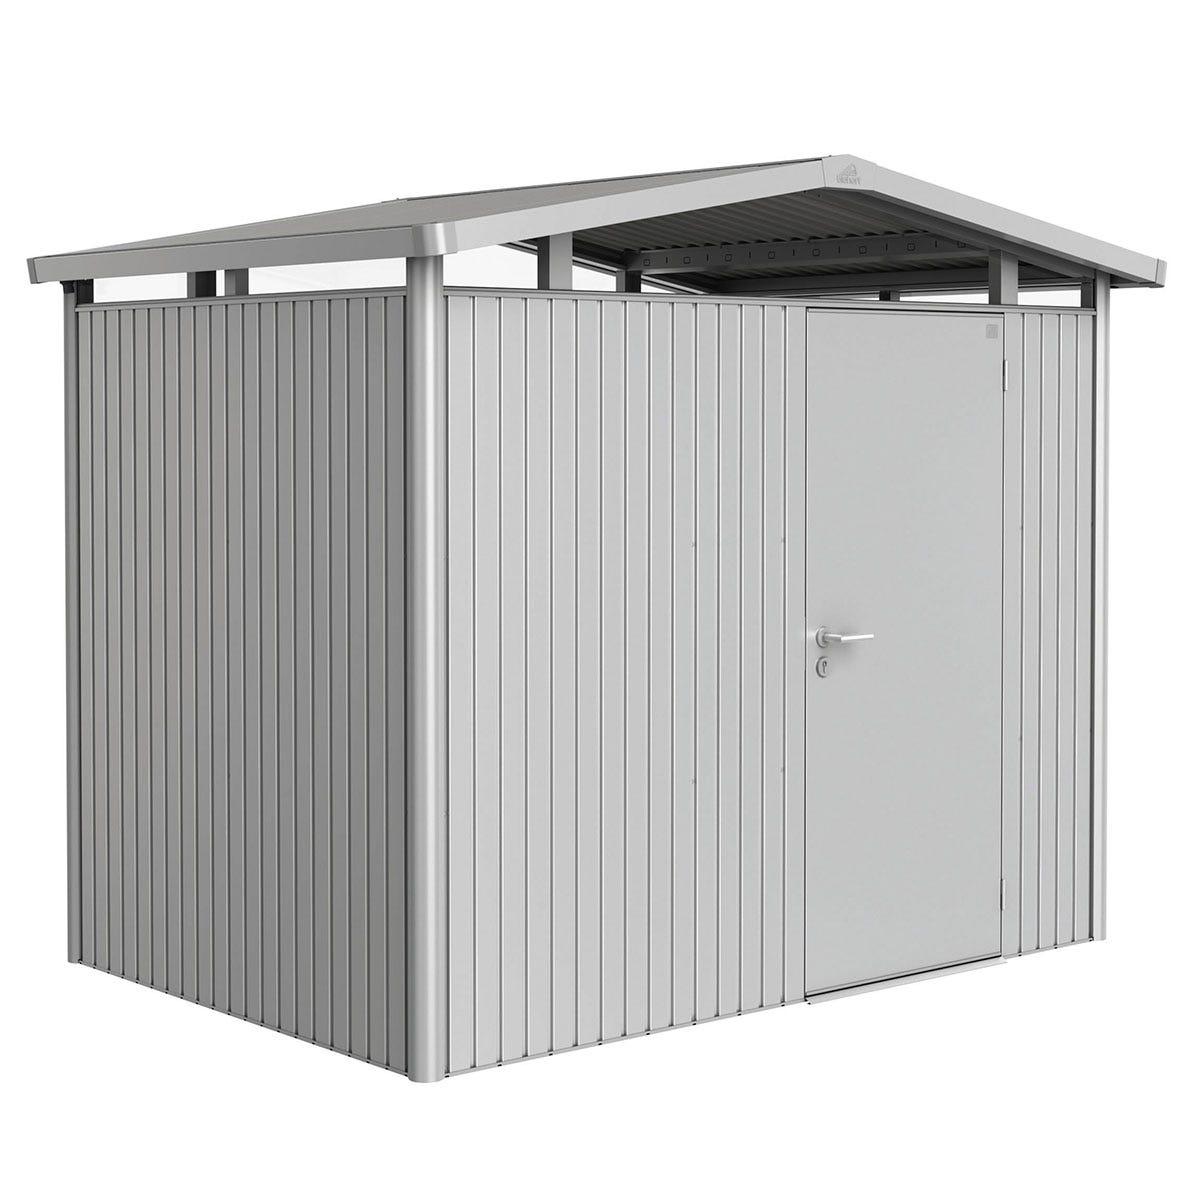 Biohort Panorama Metal Shed P2 Standard Door 9' x 6' 5'' - Metallic Silver